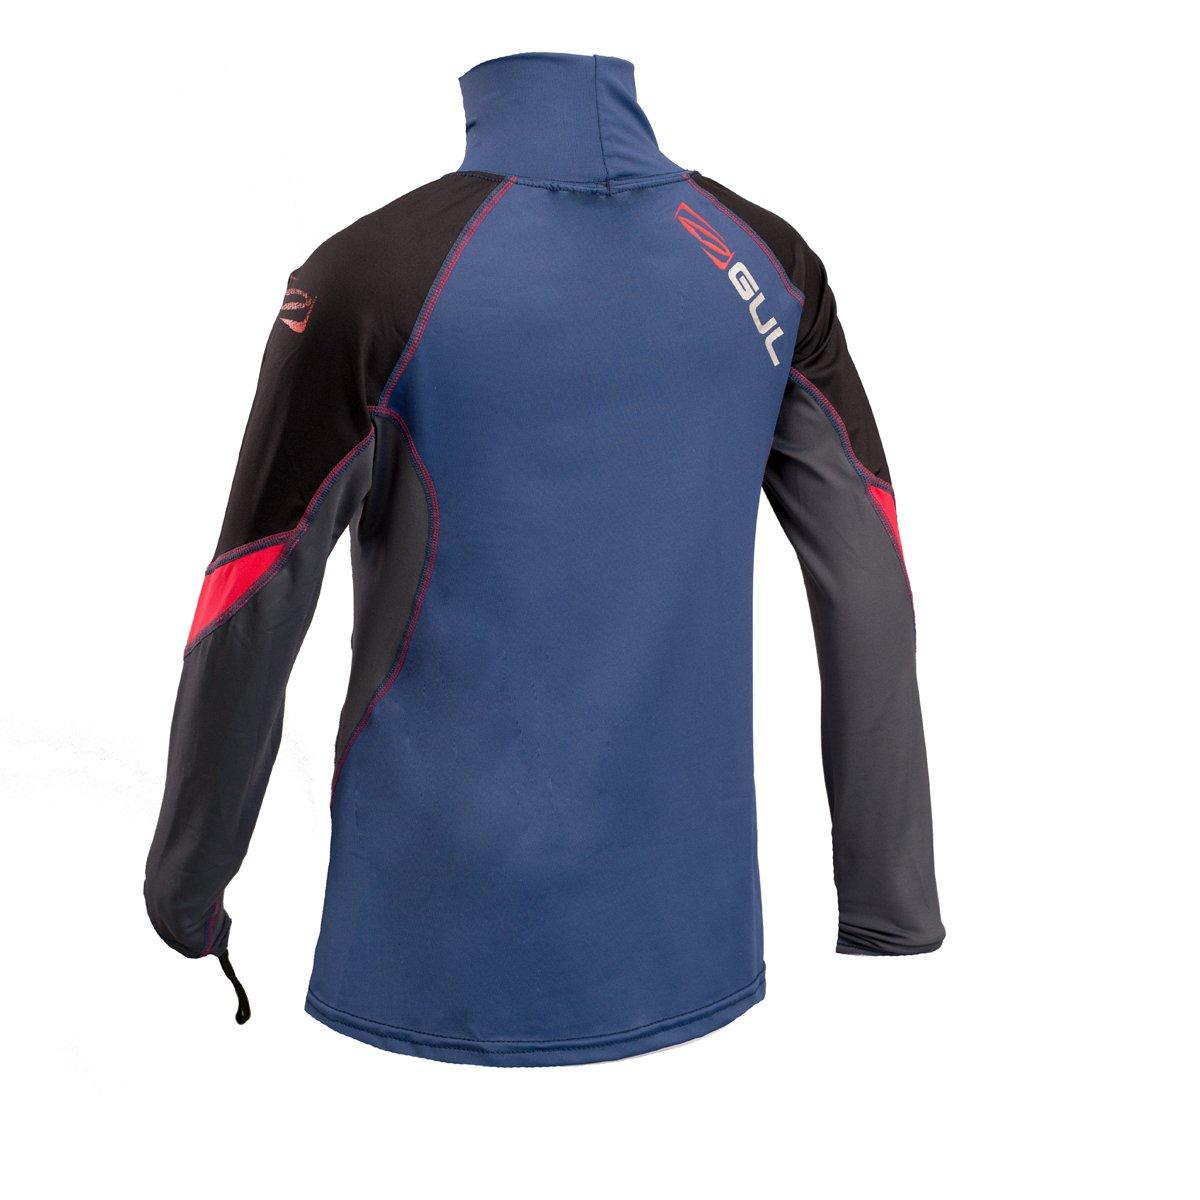 GUL 2018 Junior Long Sleeve Rash Vest Blue//Red RG0344-B4